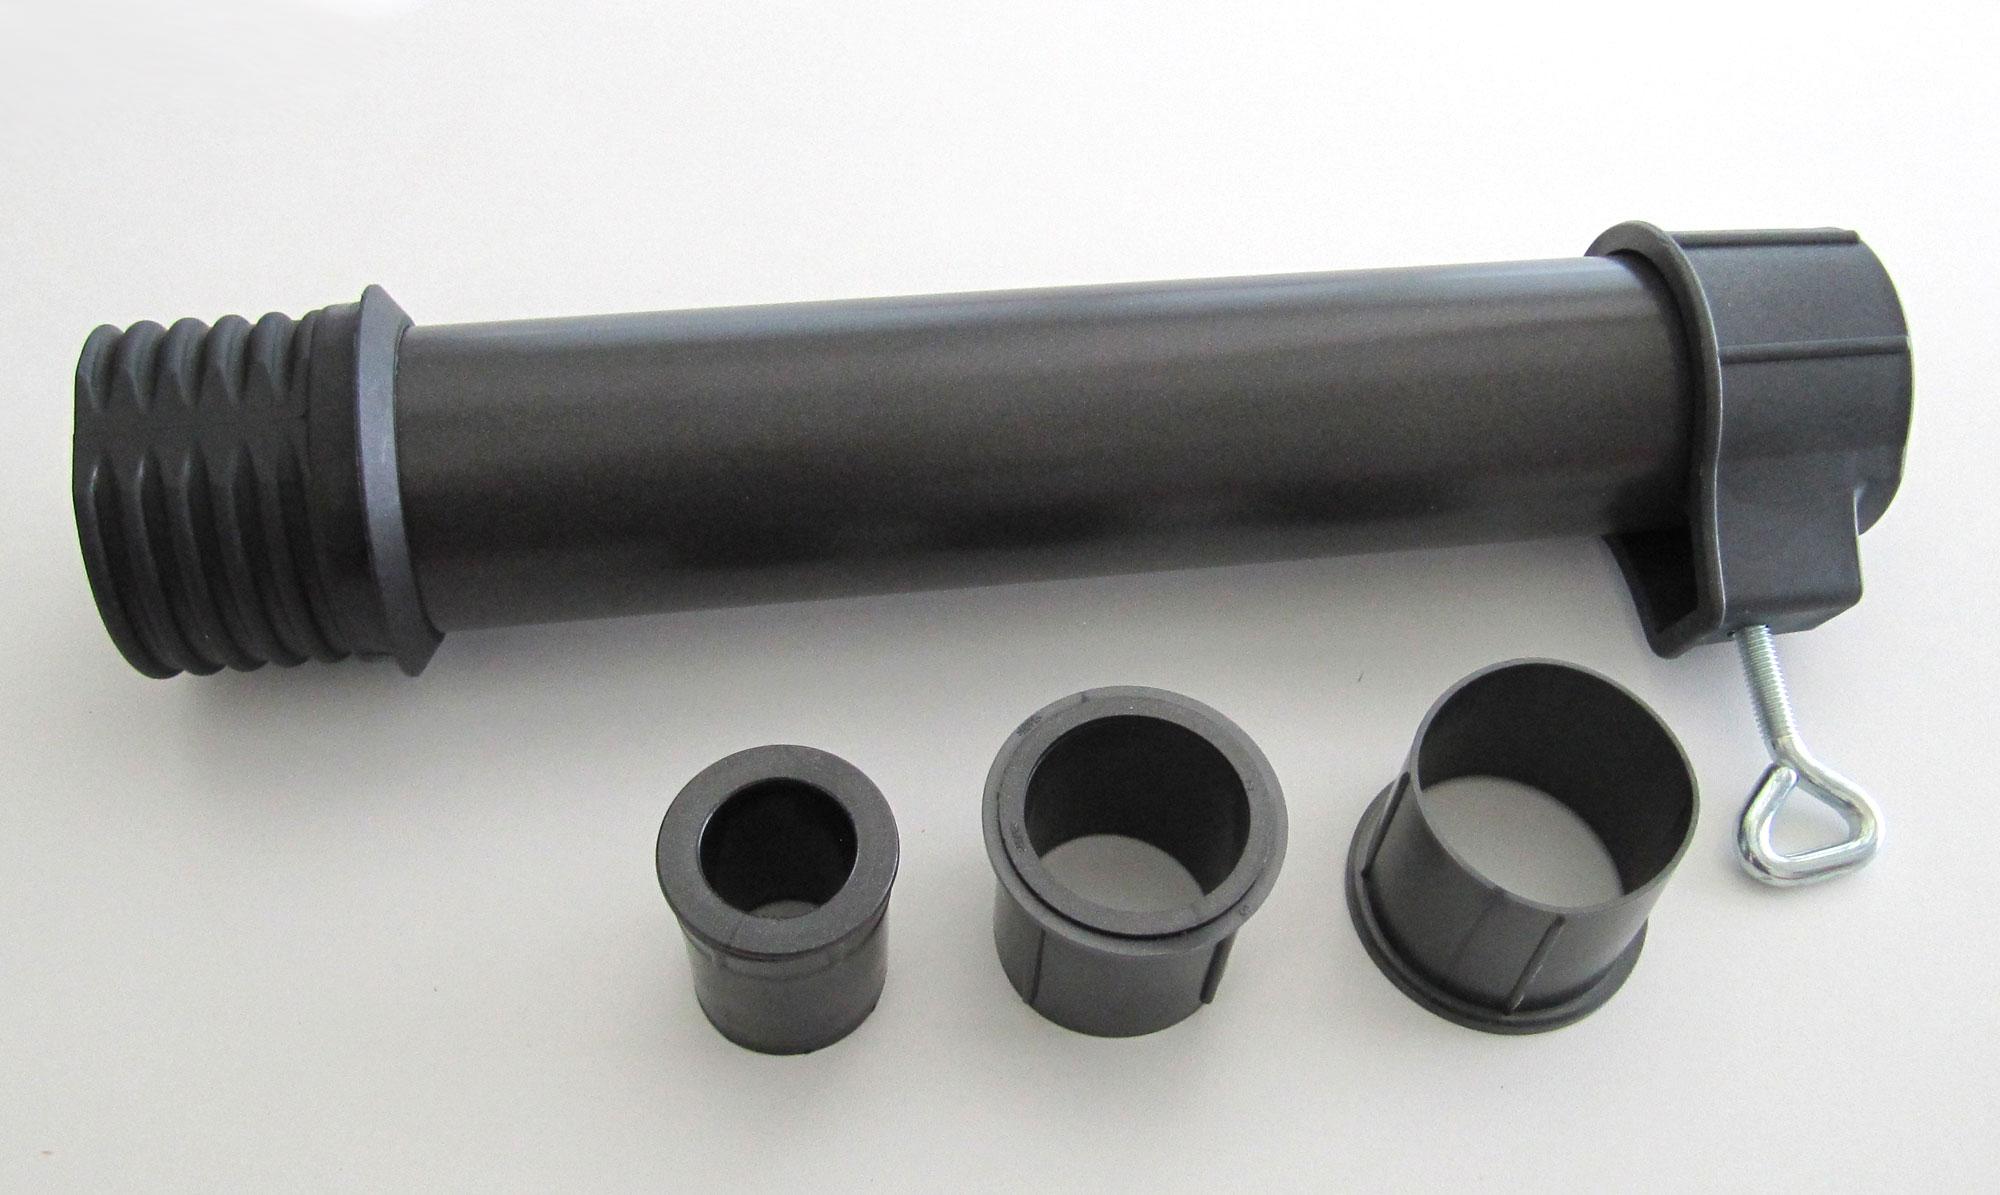 Aluminiumrohr Set 5-fach Adapter für Schirmstöcke Ø 26 - 56 mm grau Bild 1